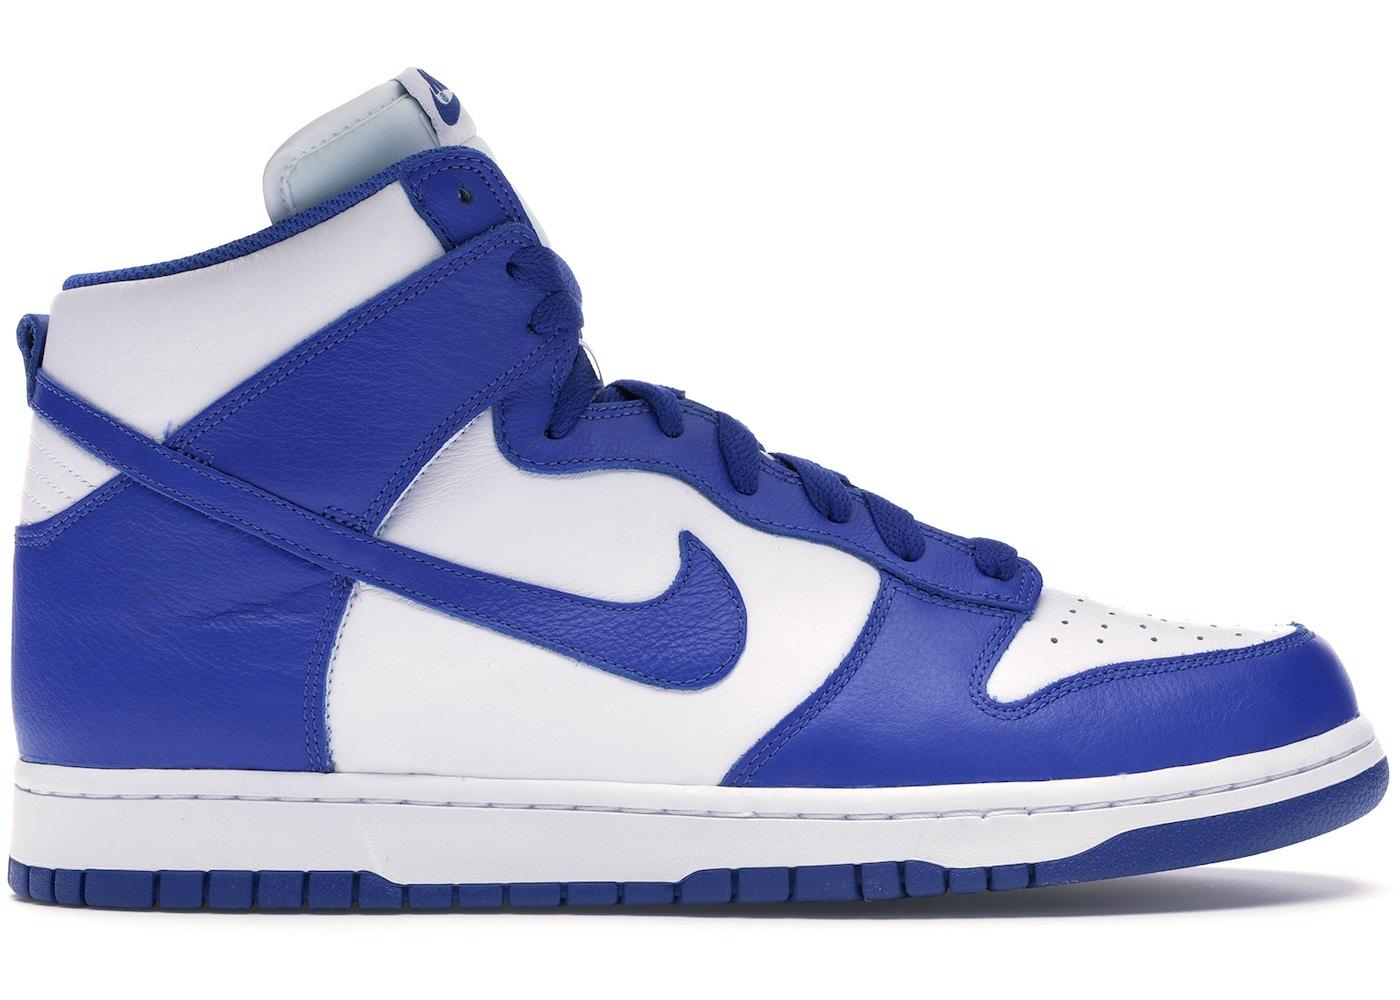 pretty nice d019c dddcb Buy Nike Basketball Dunk Shoes   Deadstock Sneakers